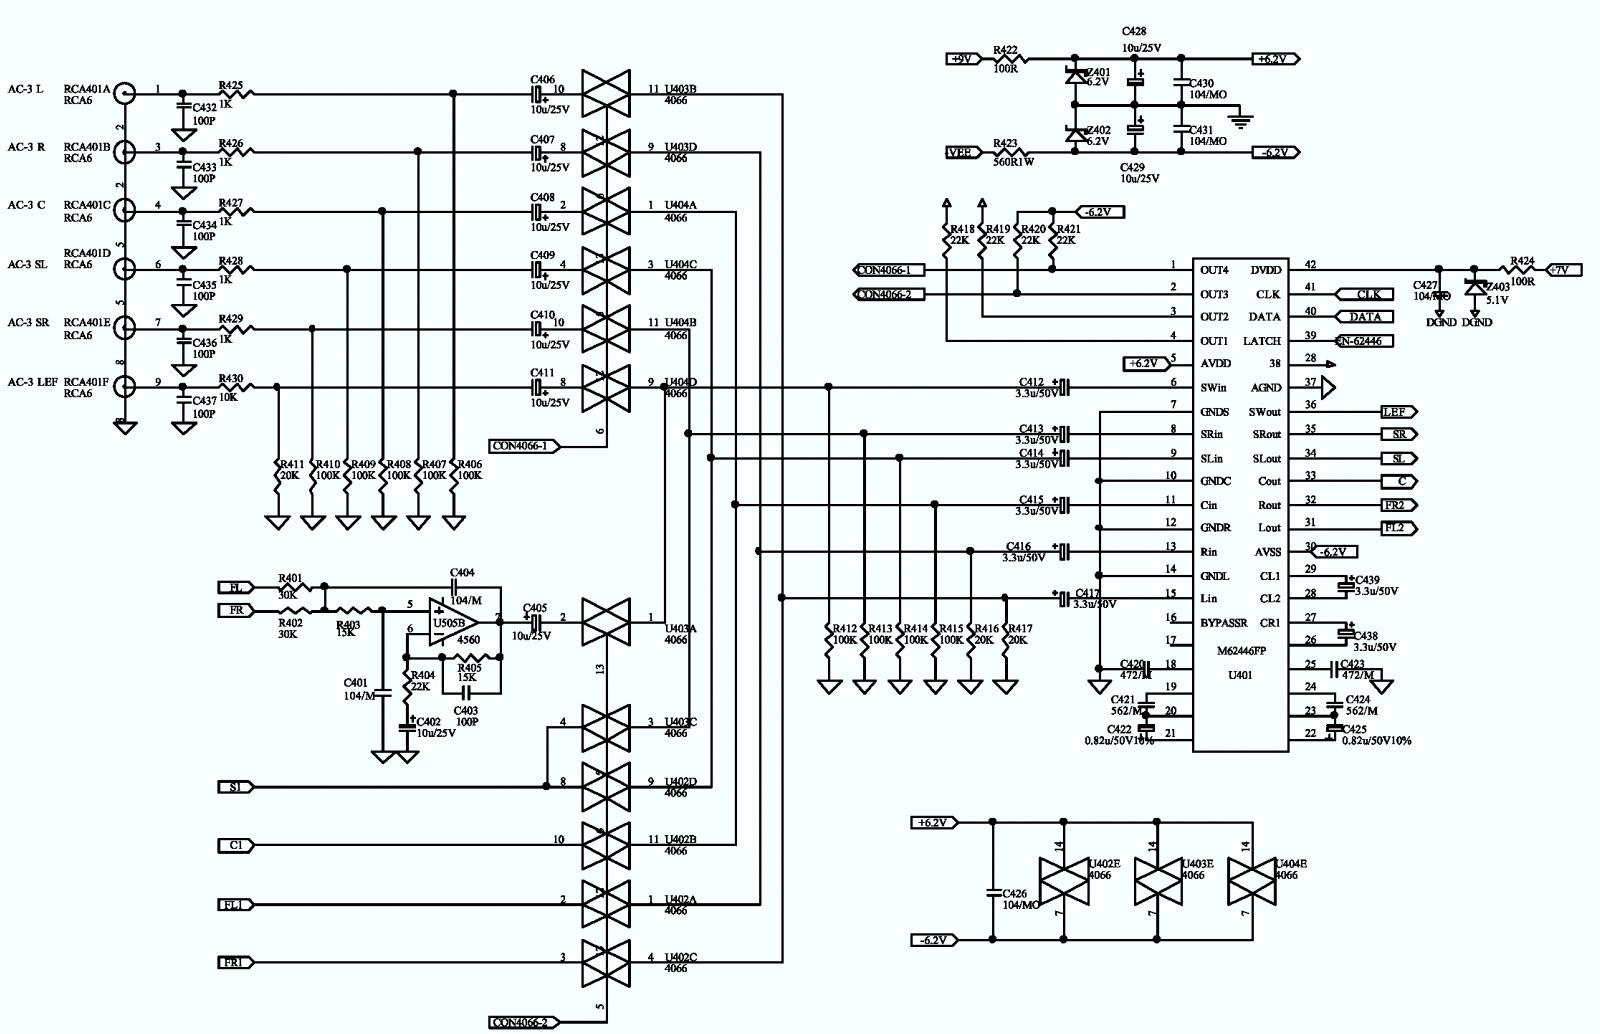 jbl esc230 120v speaker system – schematic – wiring ... 2012 ford focus audio system wiring diagram 70 volt audio system wiring diagram #11